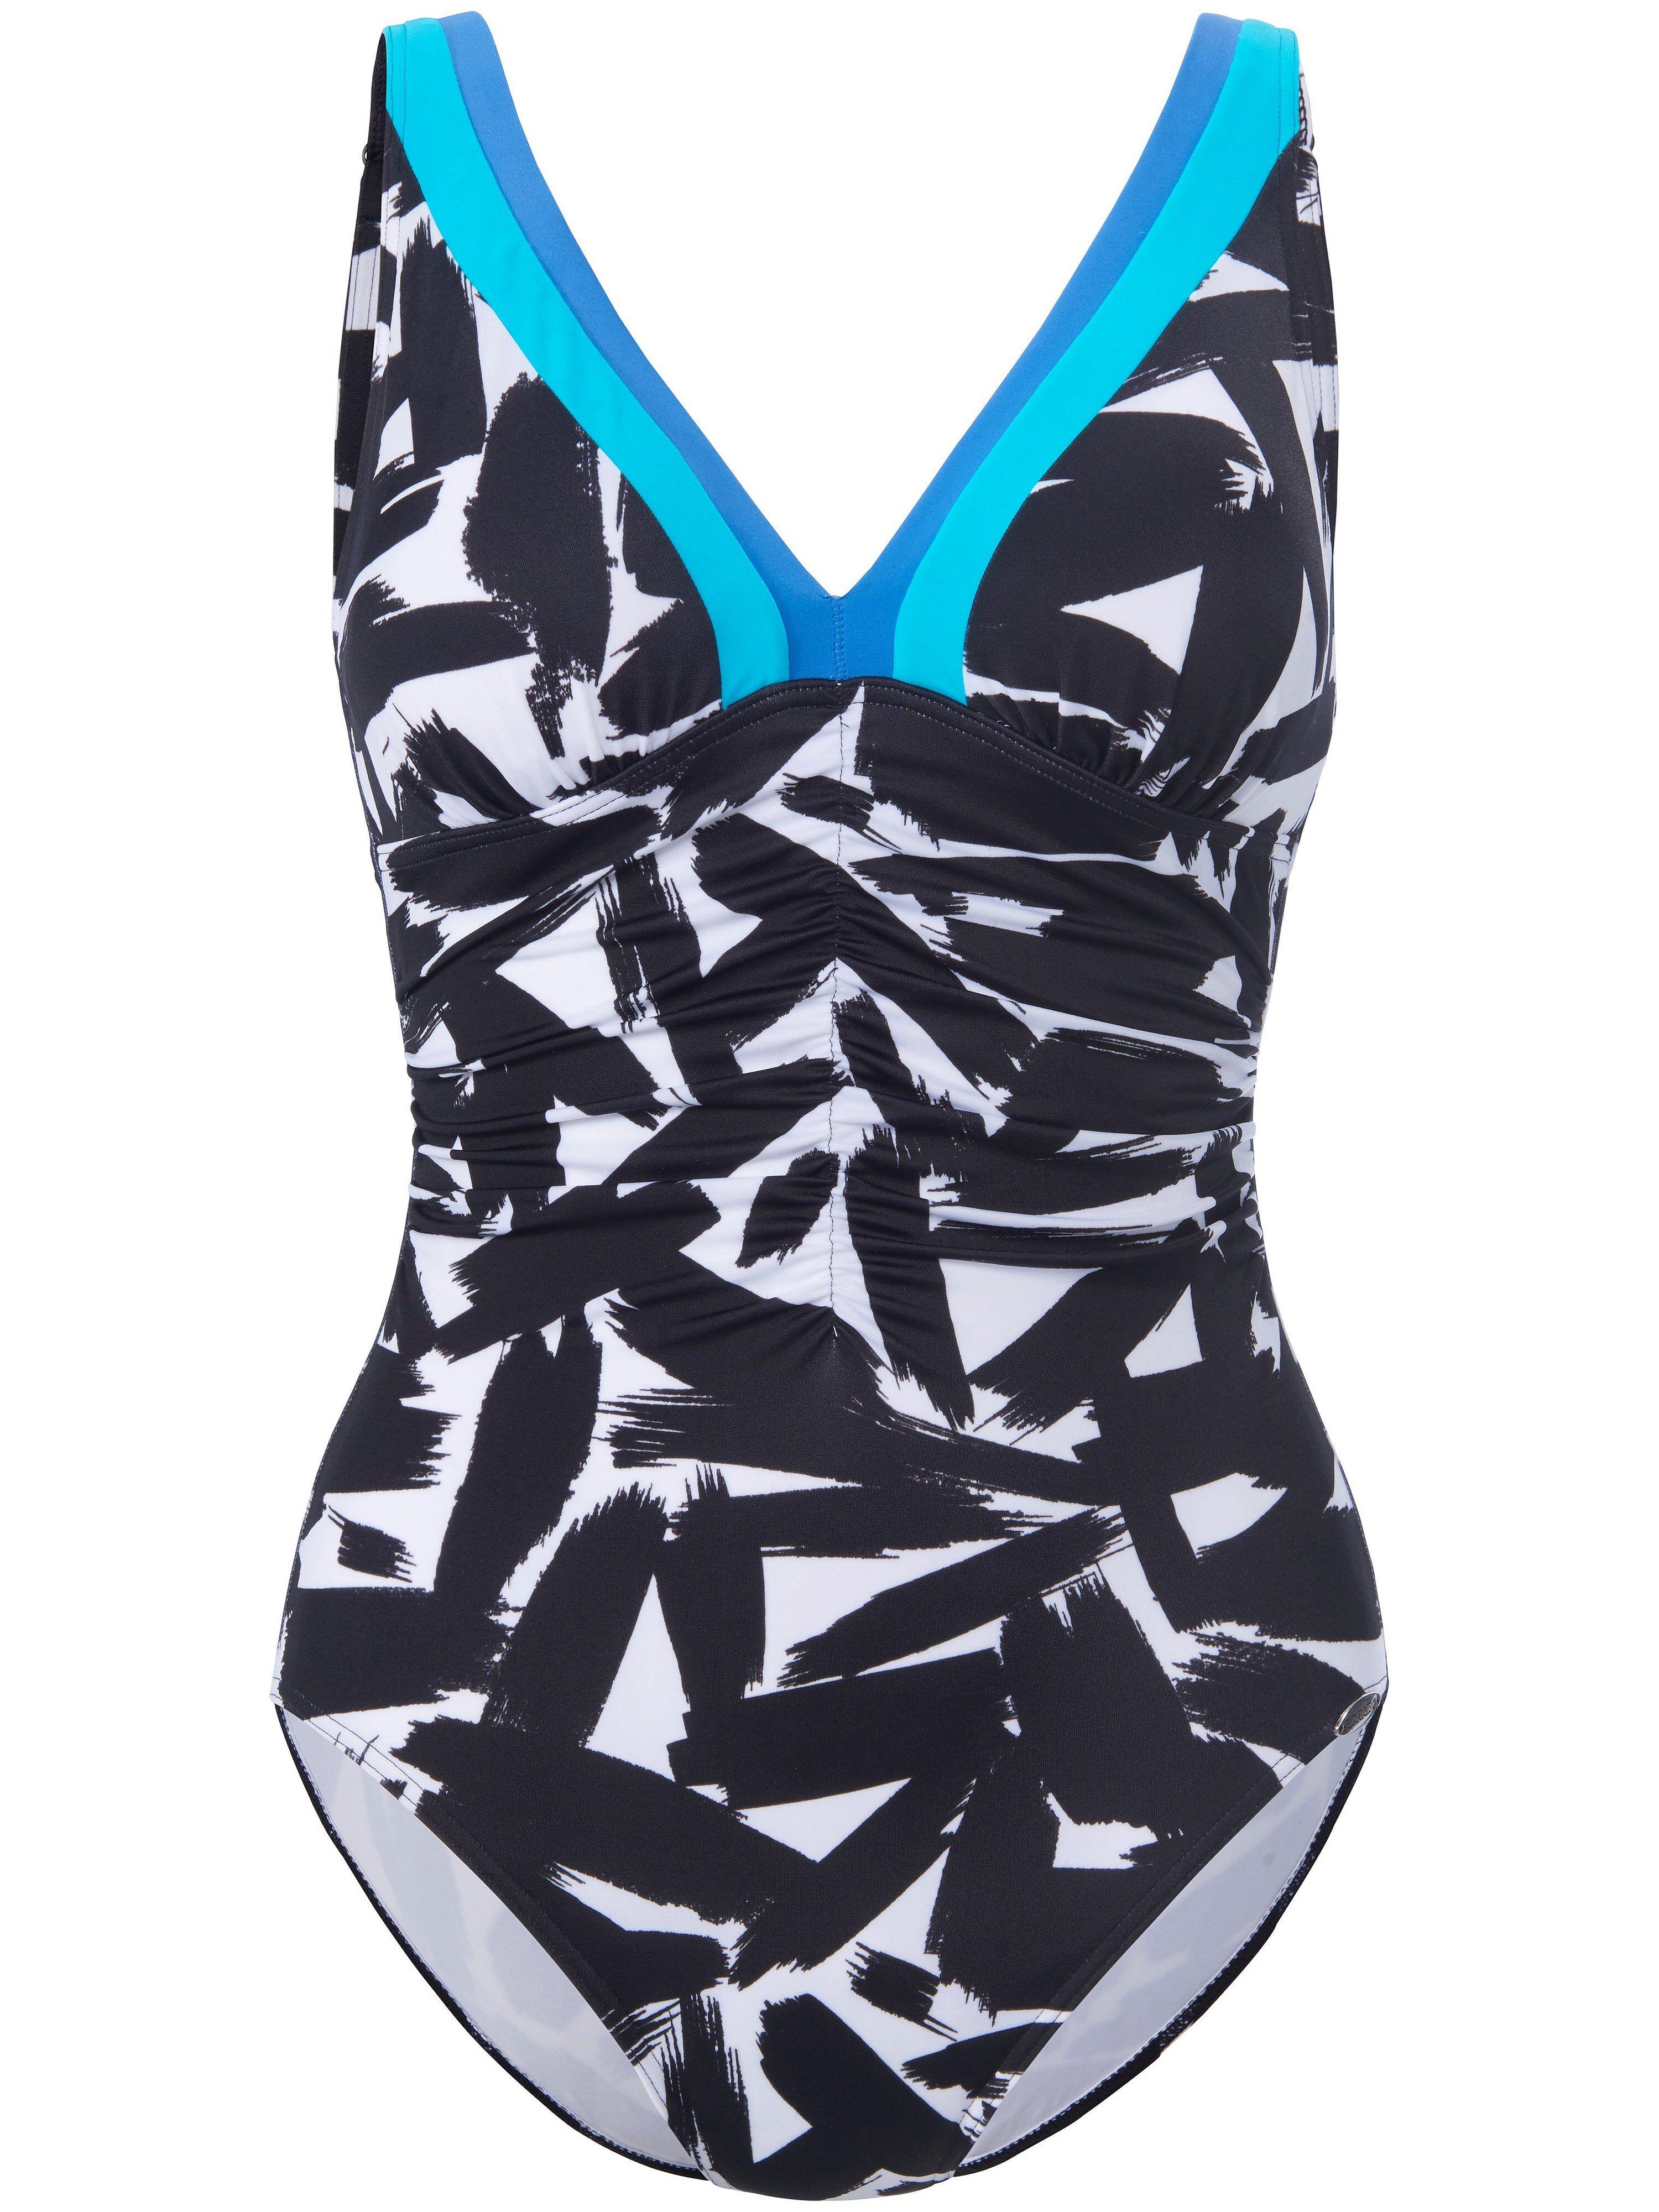 Sunflair Le maillot bain sans armatures  Sunflair noir  - Femme - 40